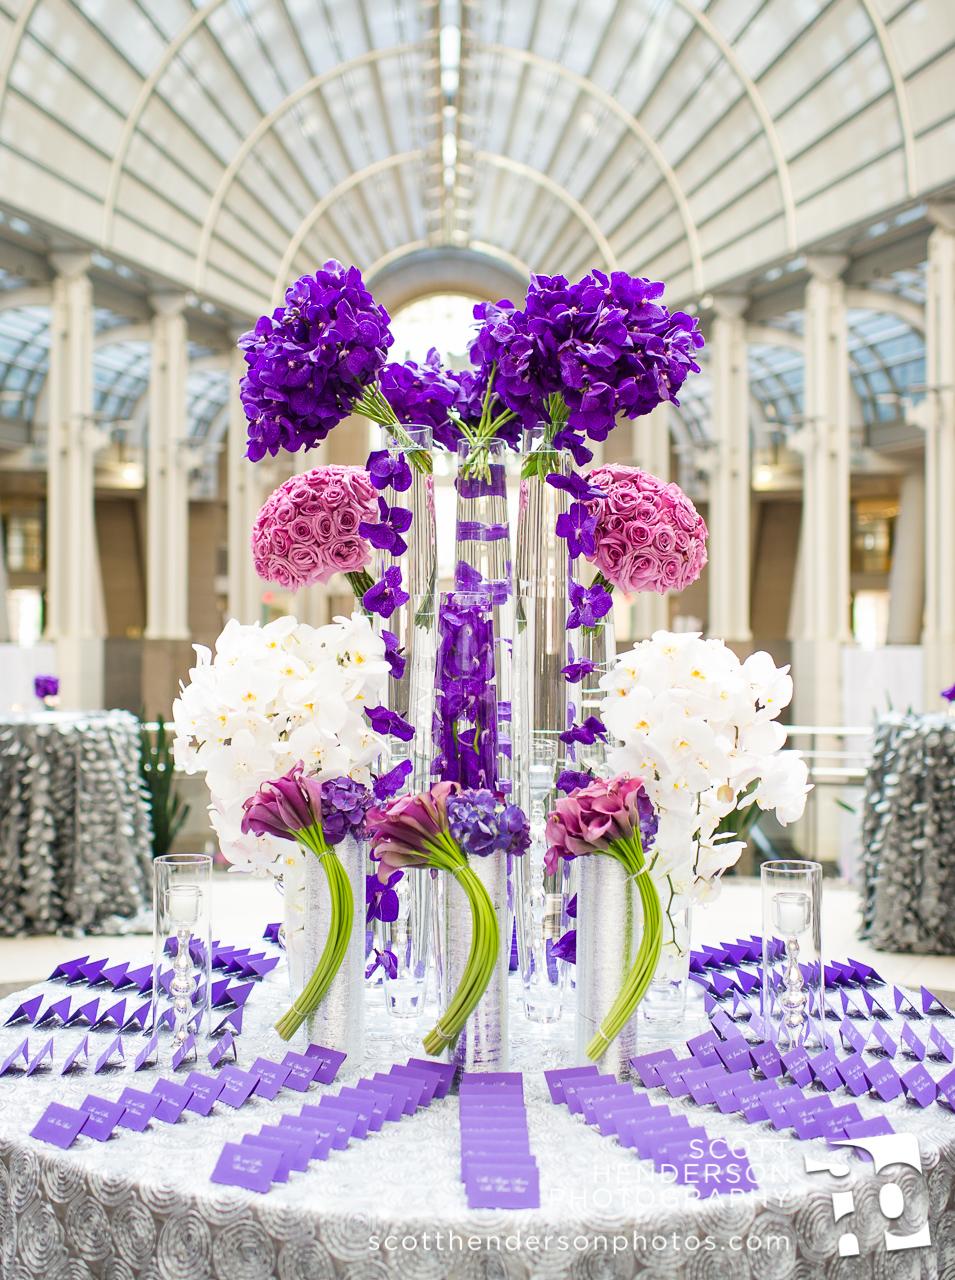 yearinreview-wedding-013.jpg